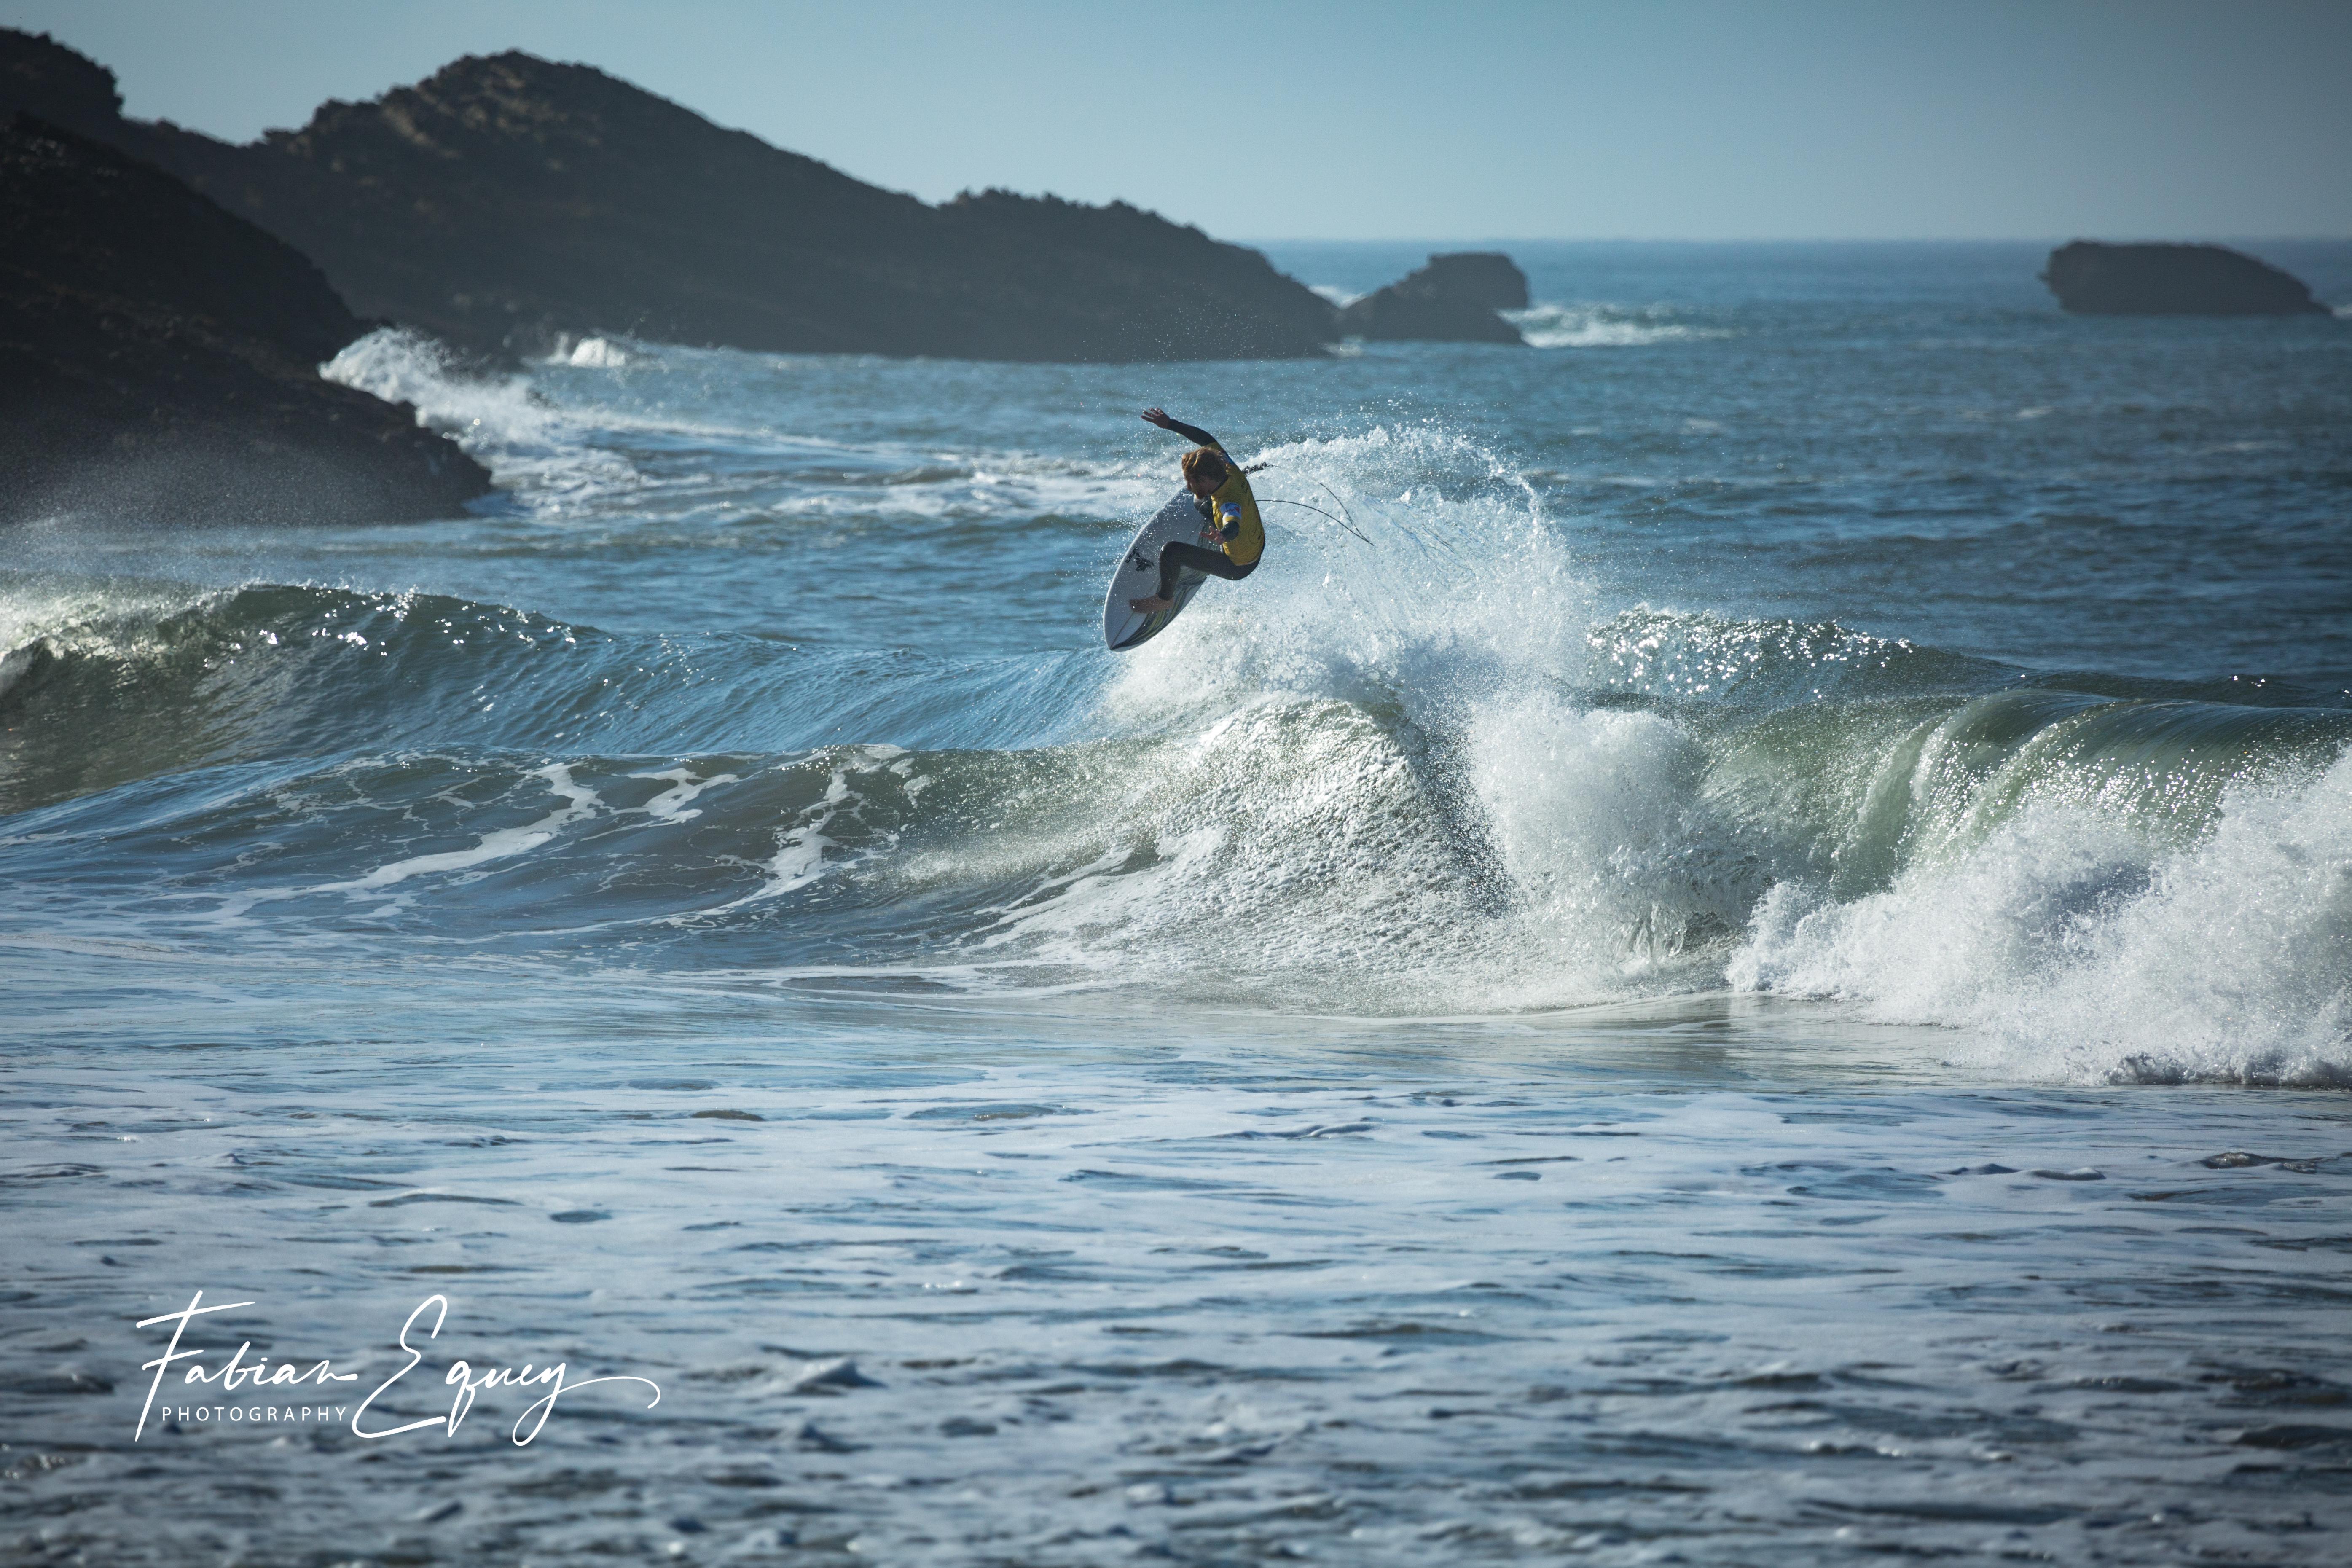 Surfer: Rolland. Biarritz